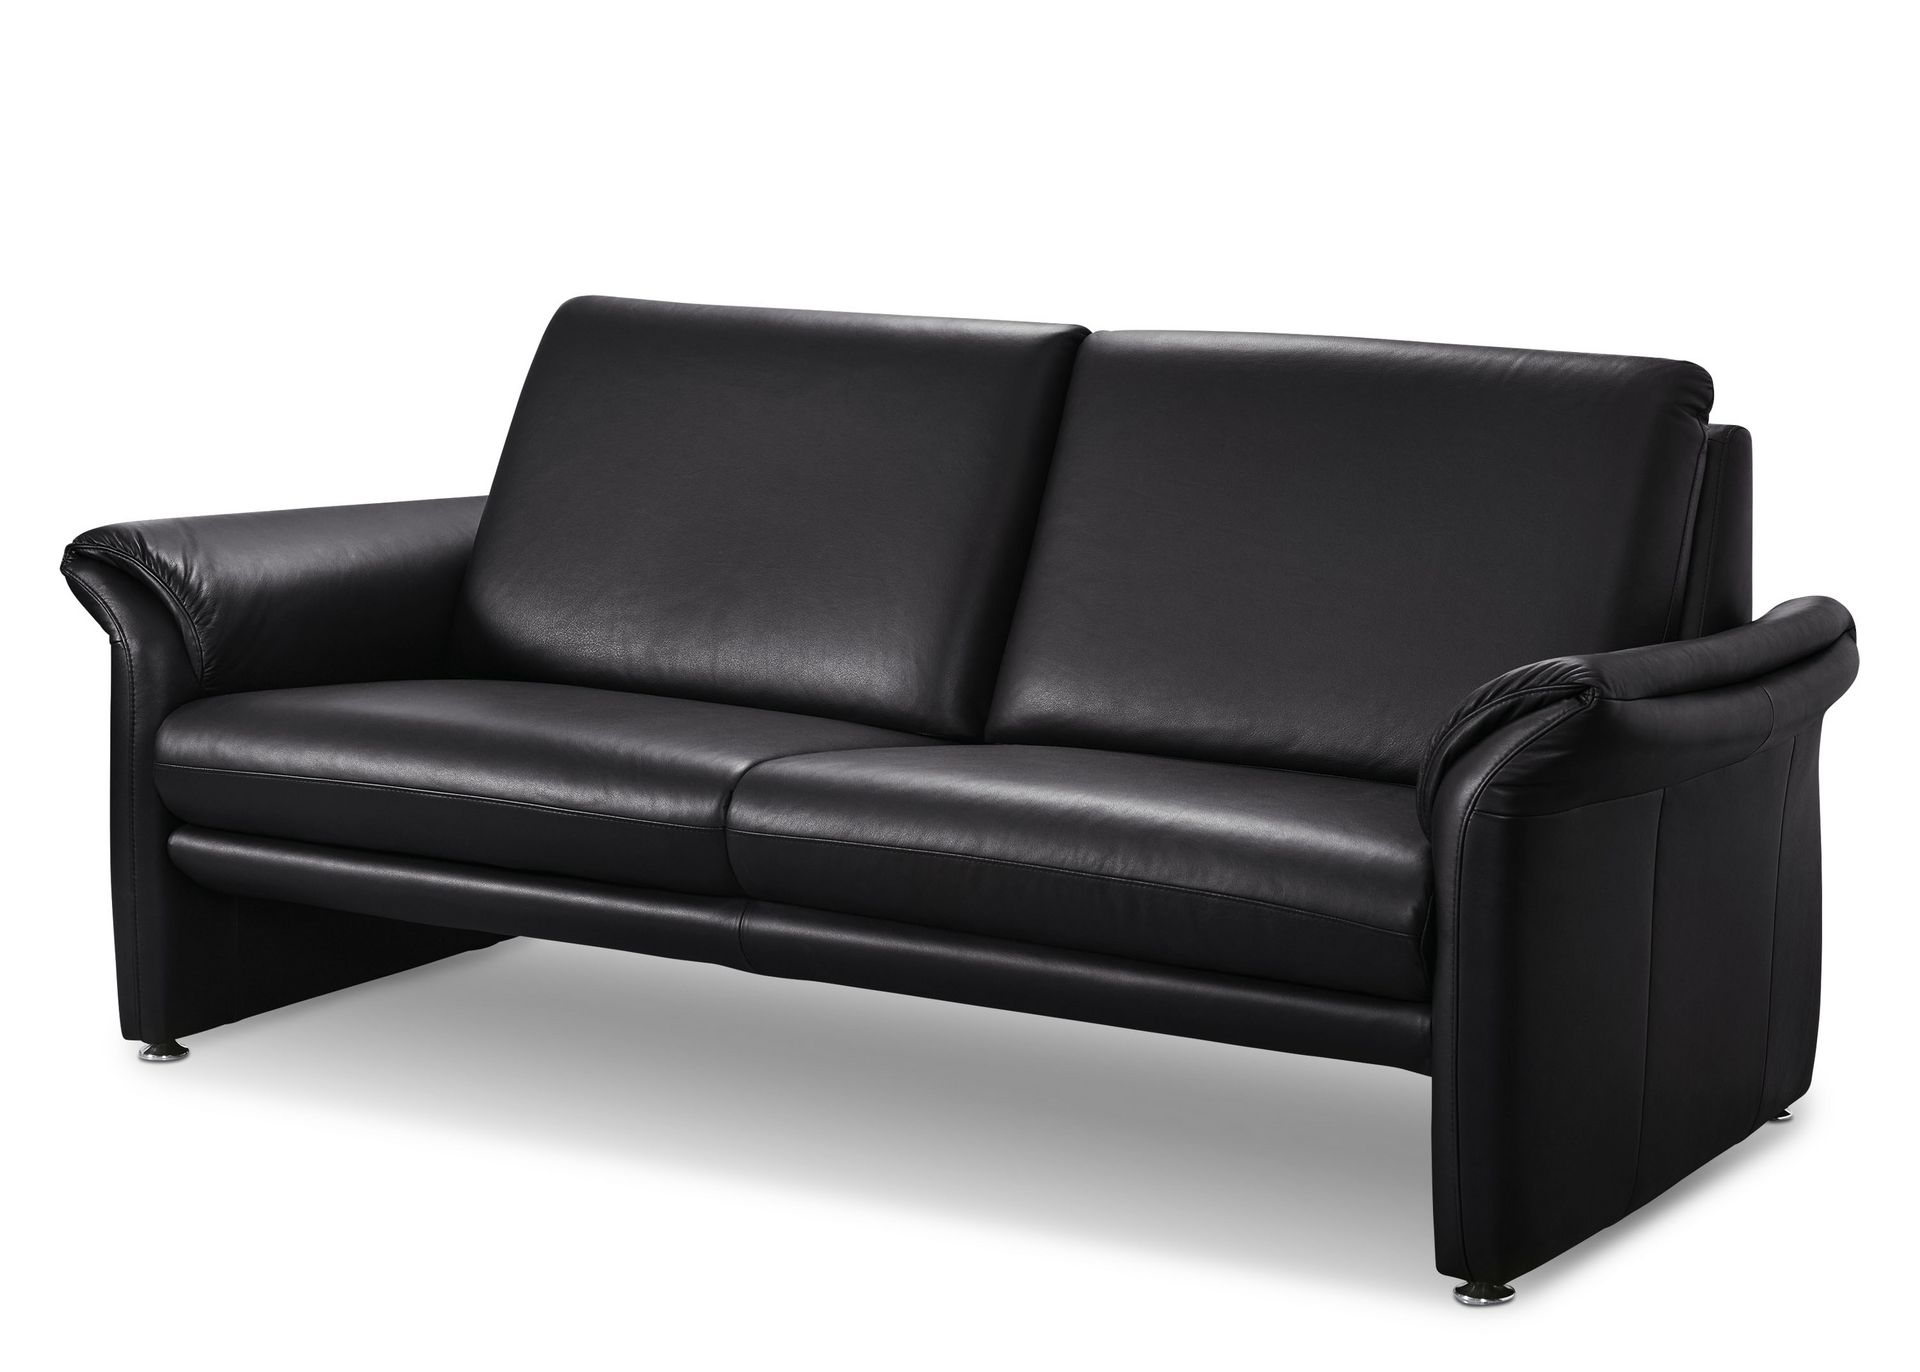 Full Size of Mondo Sofa Group Bed Bertinoro Orari Erfahrungen 1 Agata Meble Brick Softline 2 Sitzer Gro Terza Schwarz Kinderzimmer Indomo Rotes Grün Barock 3 Arten Sofa Mondo Sofa